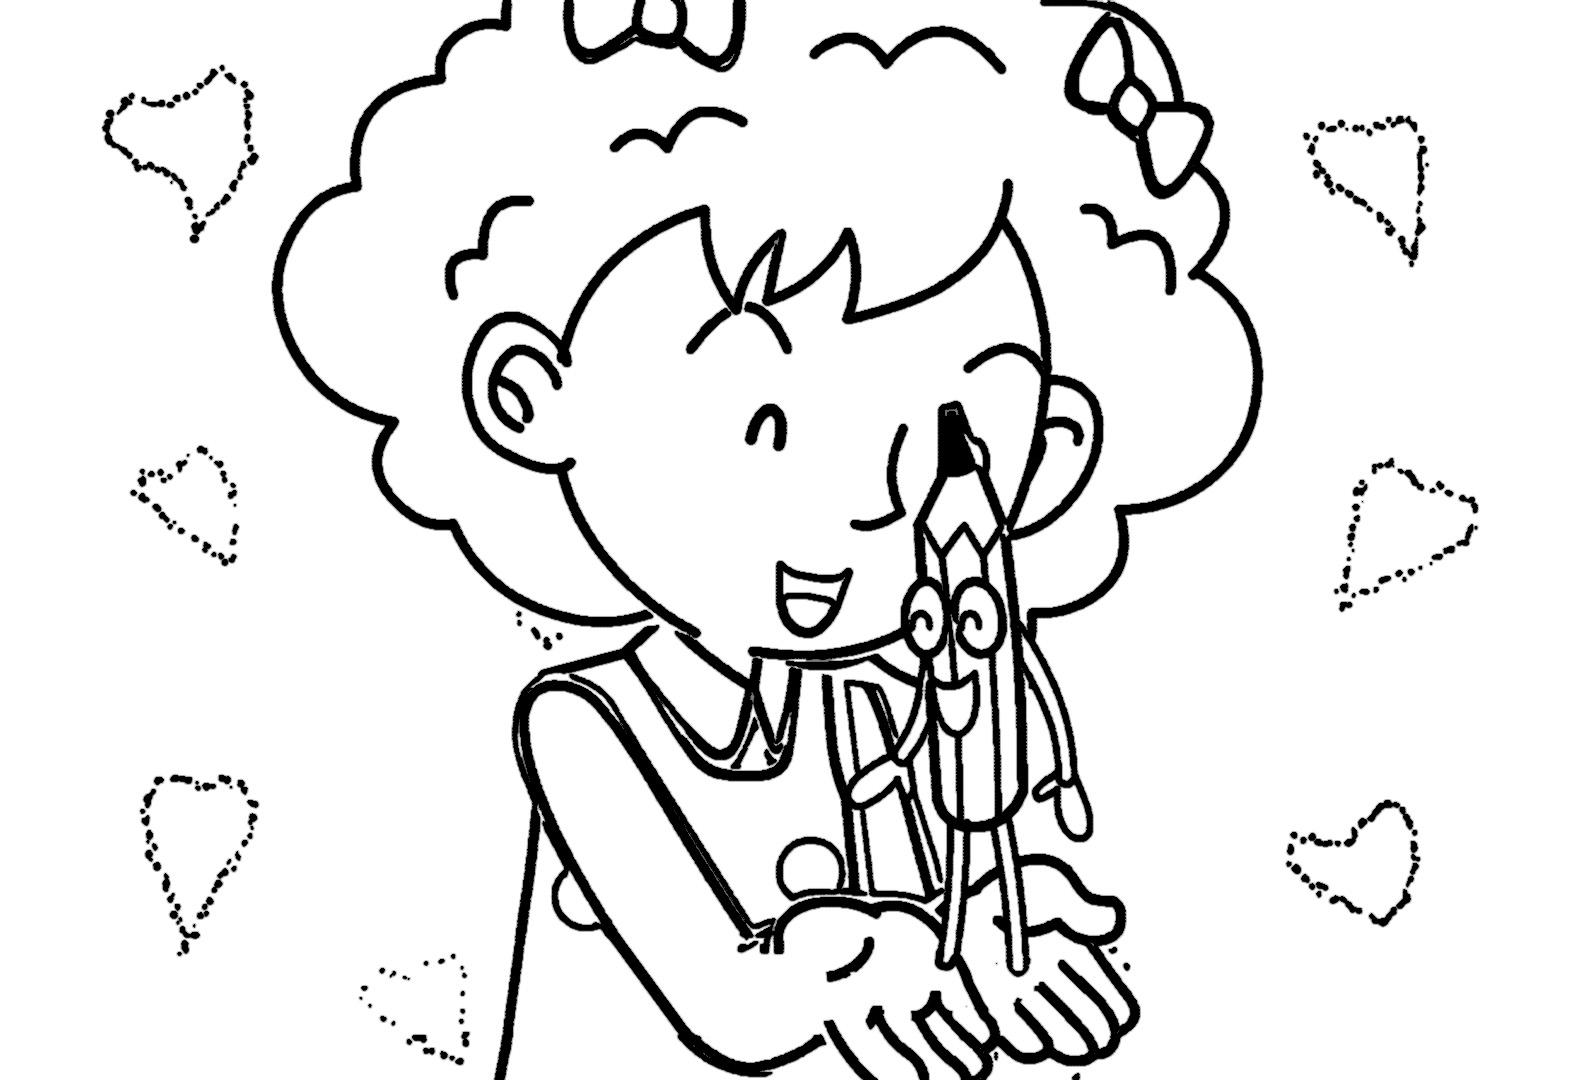 Speaking Cartoon Kids Coloring Page 15